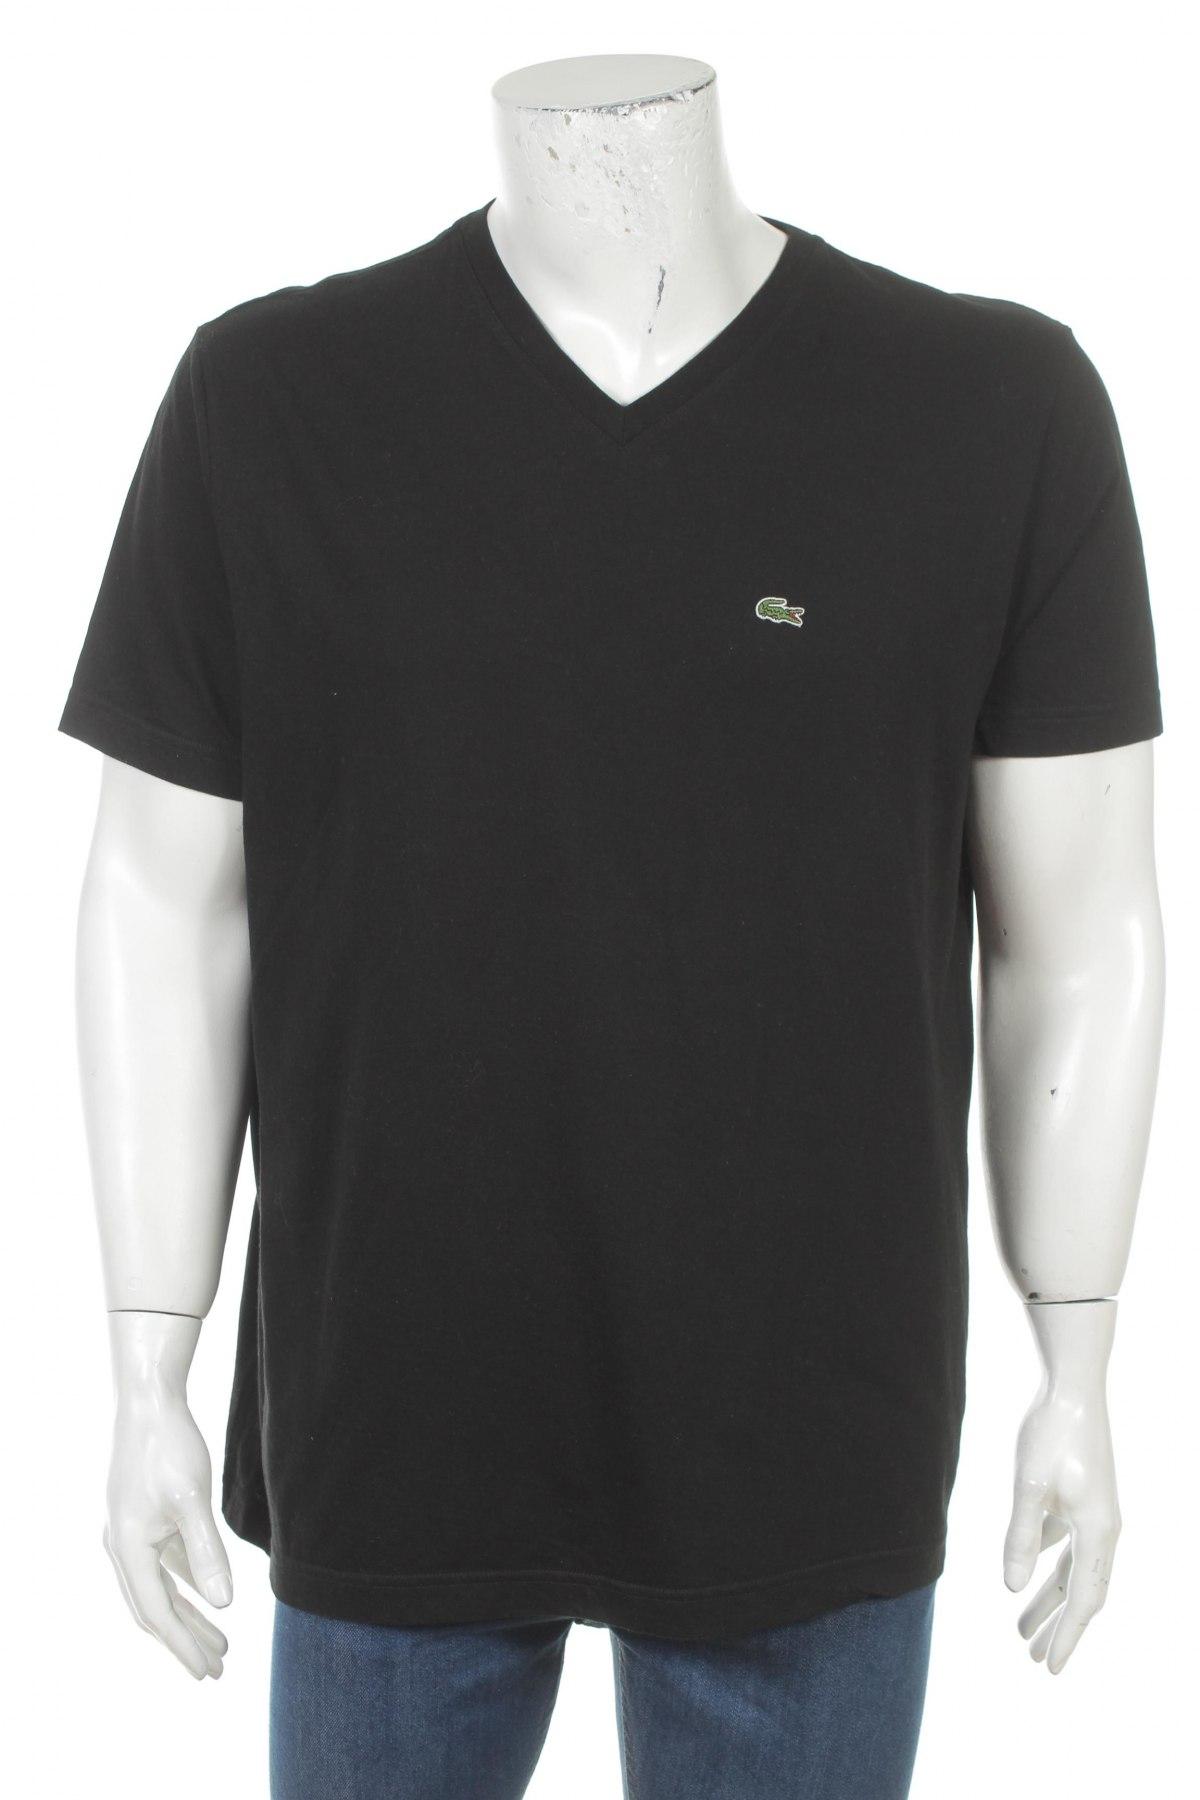 4070d28e1012 Ανδρικό t-shirt Lacoste - σε συμφέρουσα τιμή στο Remix -  100221291